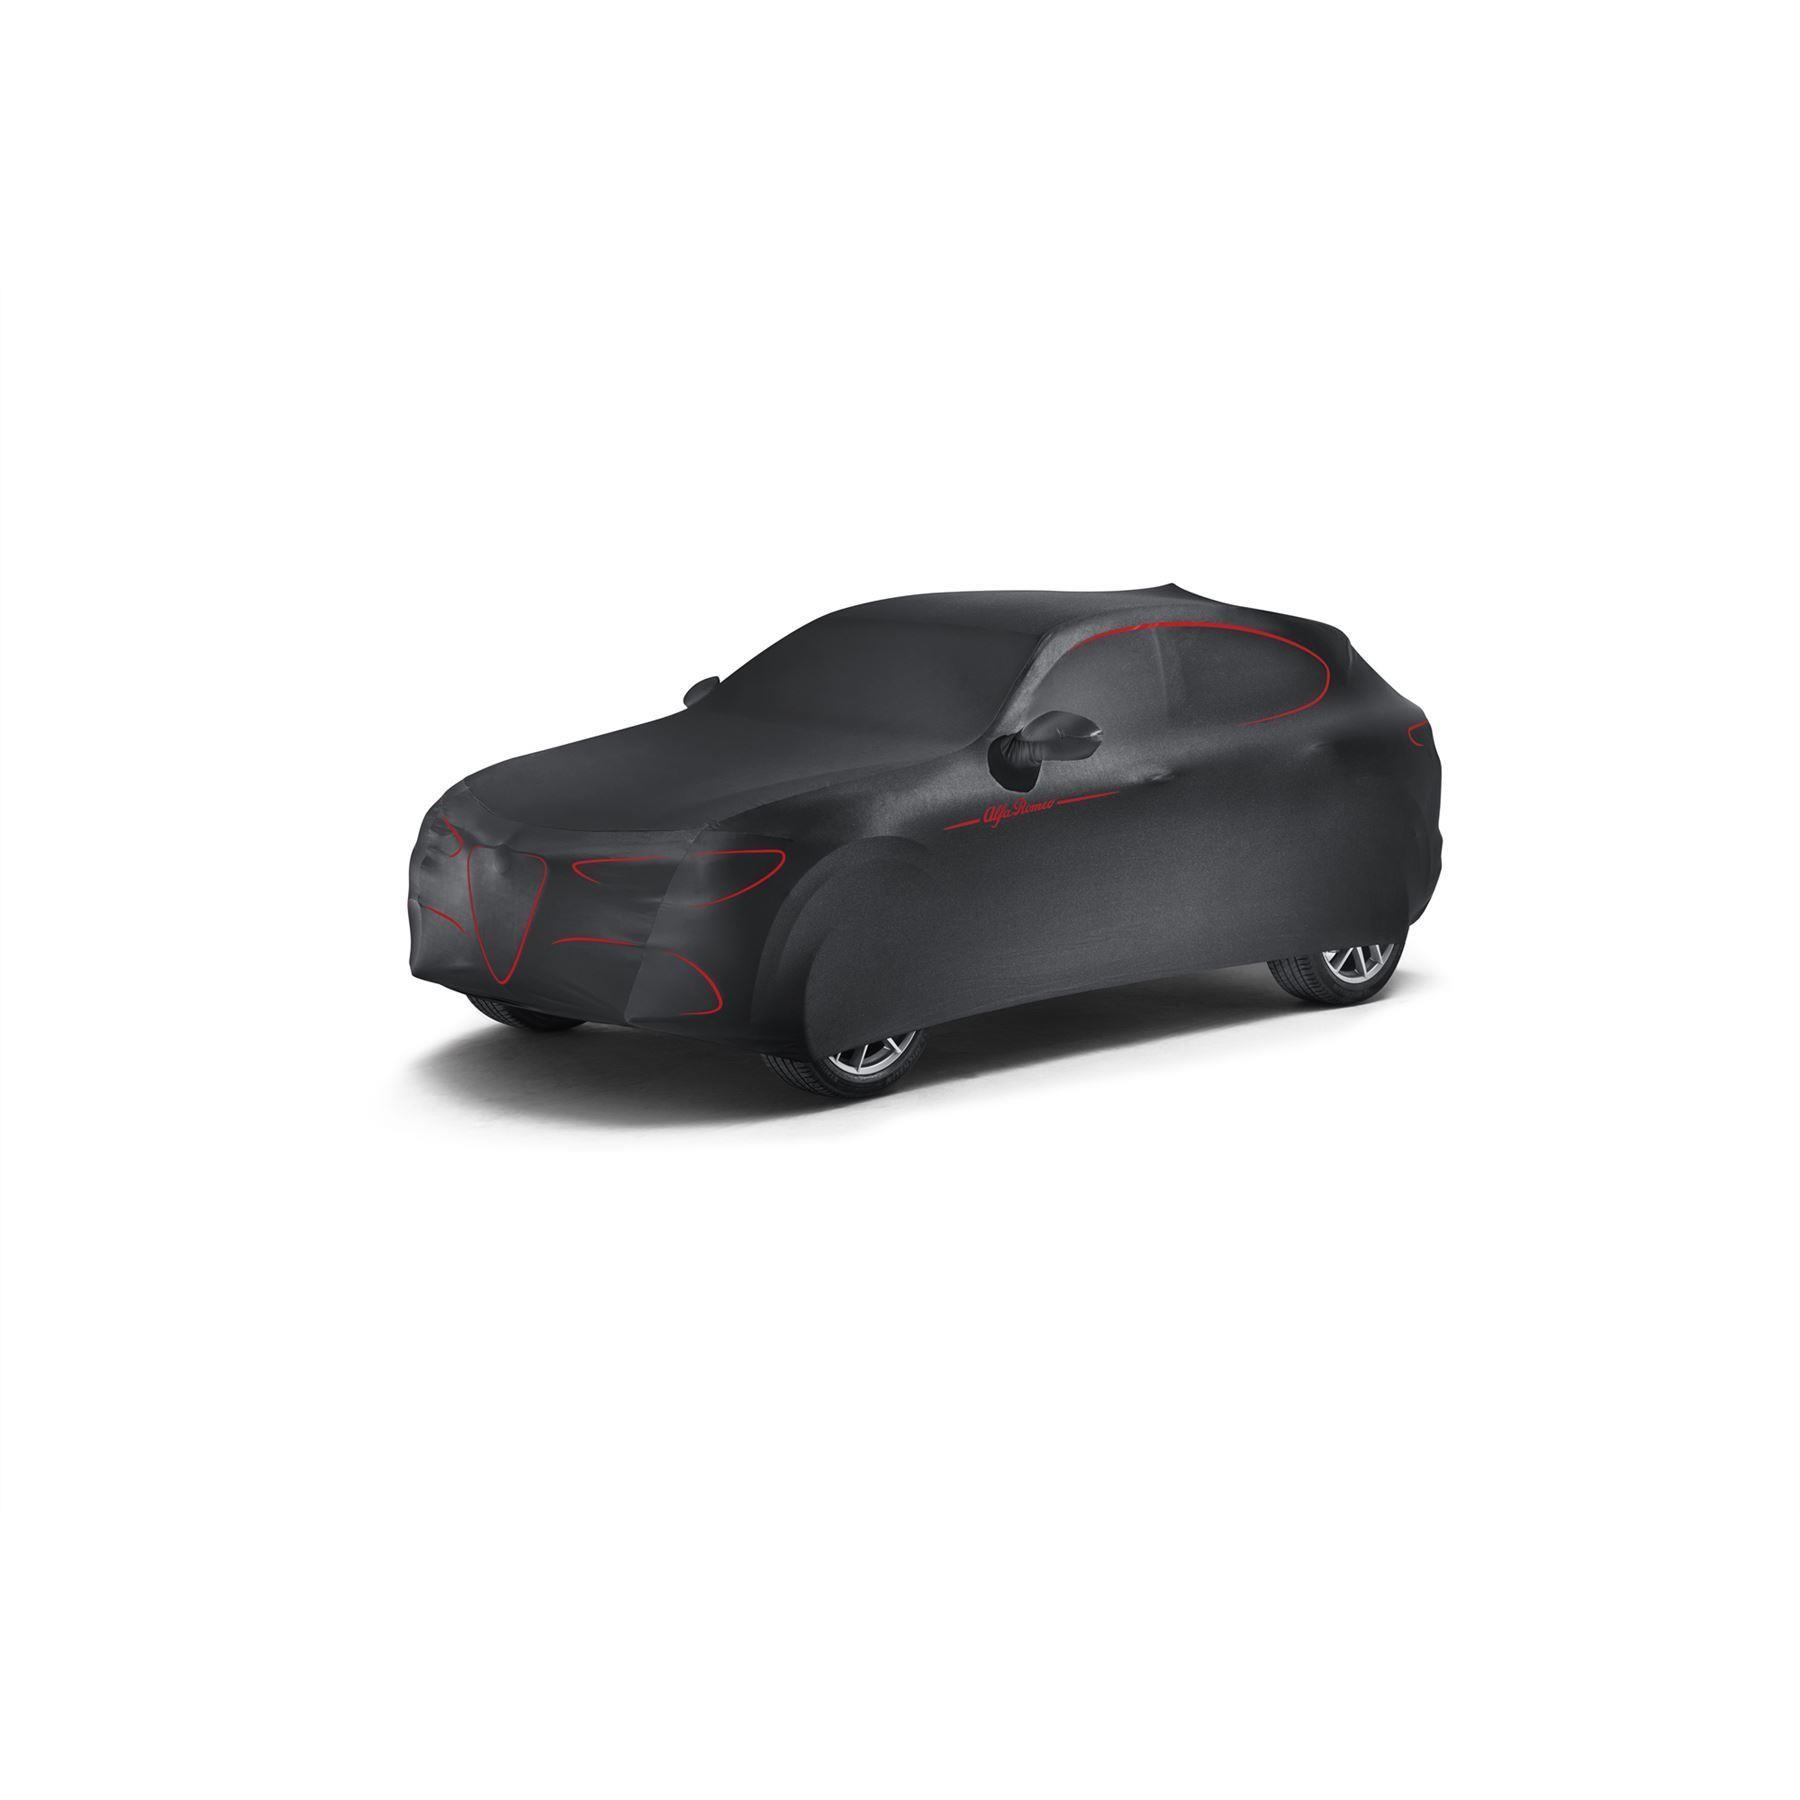 Stelvio Outdoor/Scratch/Bodywork Protection Car Cover